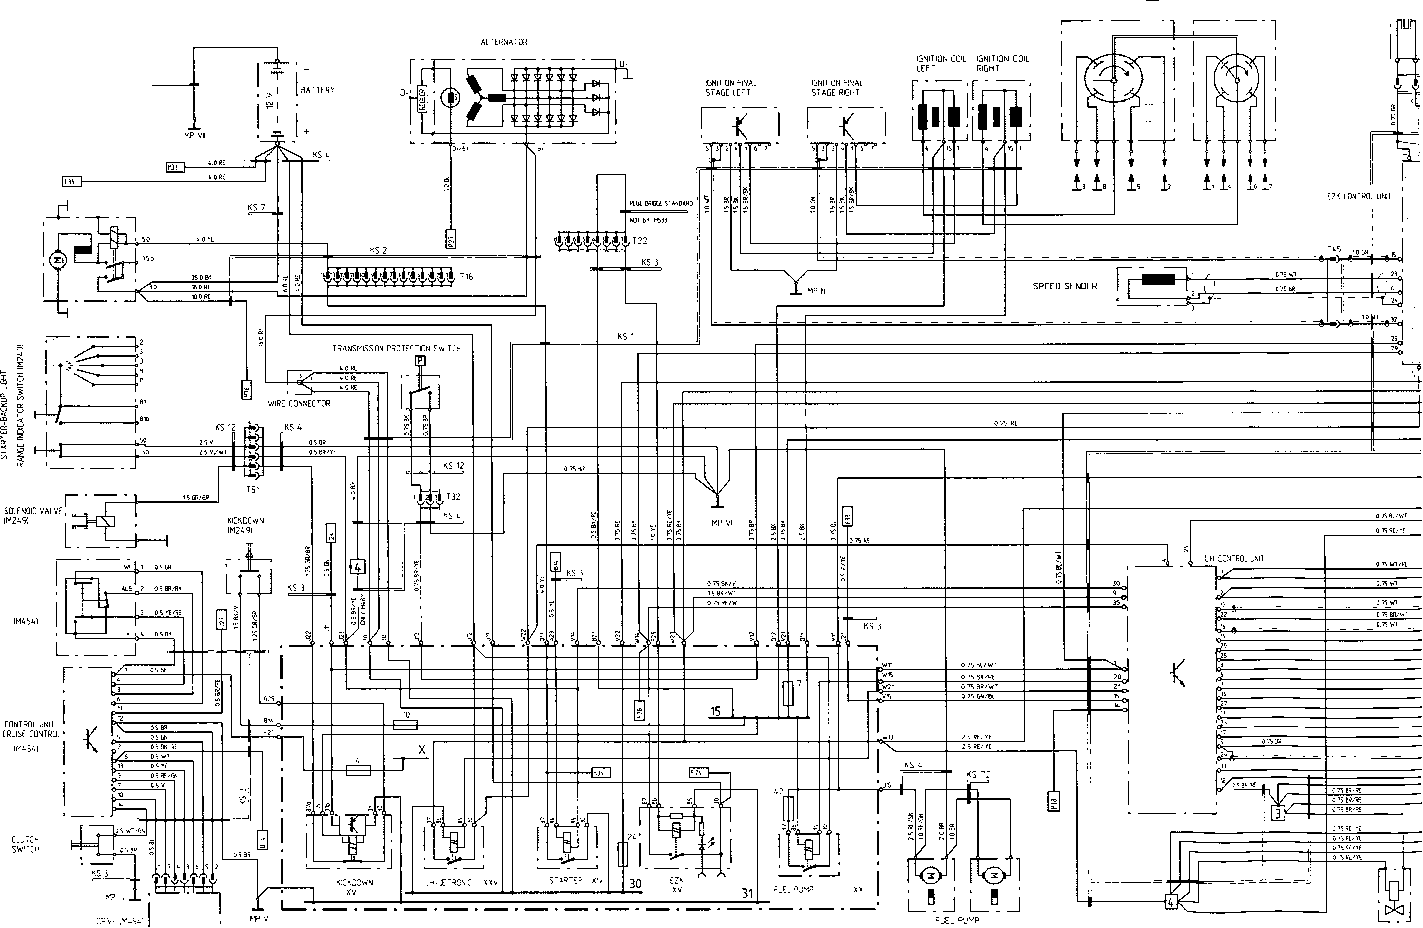 Diagram Wiring Diagram Type 40 S Model 40 Page Wiring Diagram 40 ...